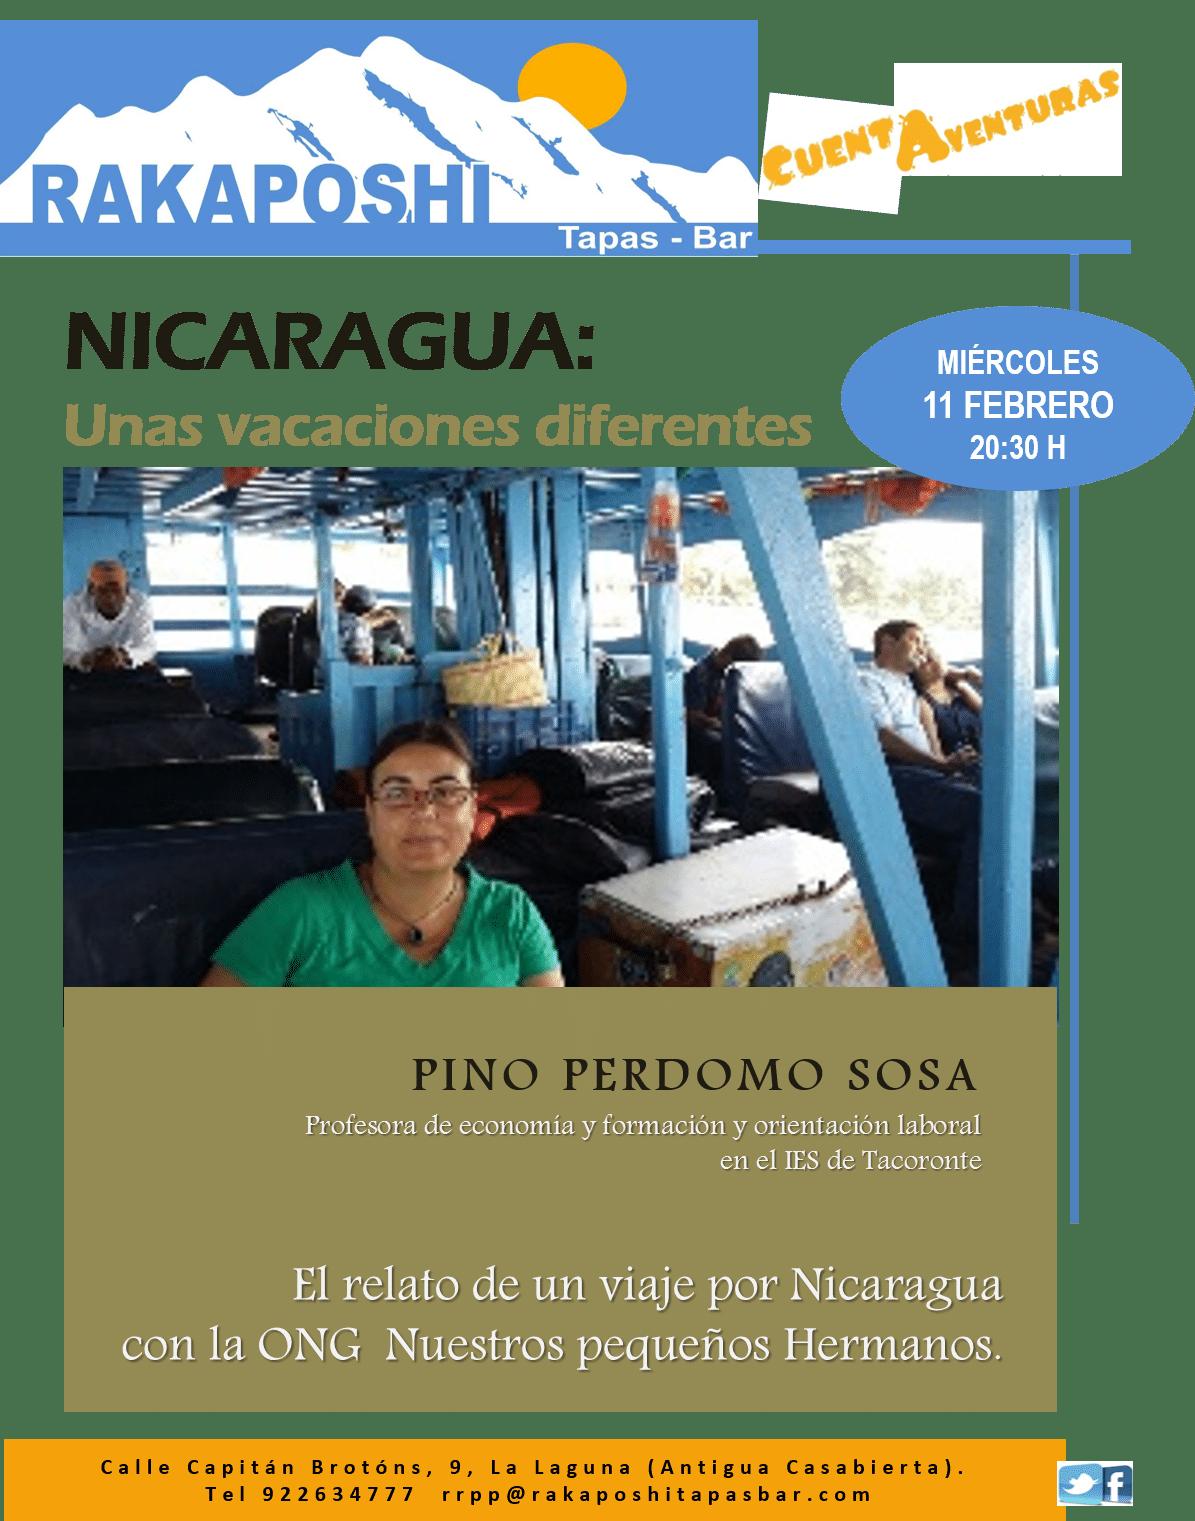 11 febrero 2015. Nicaragua. Pino Perdomo Sosa